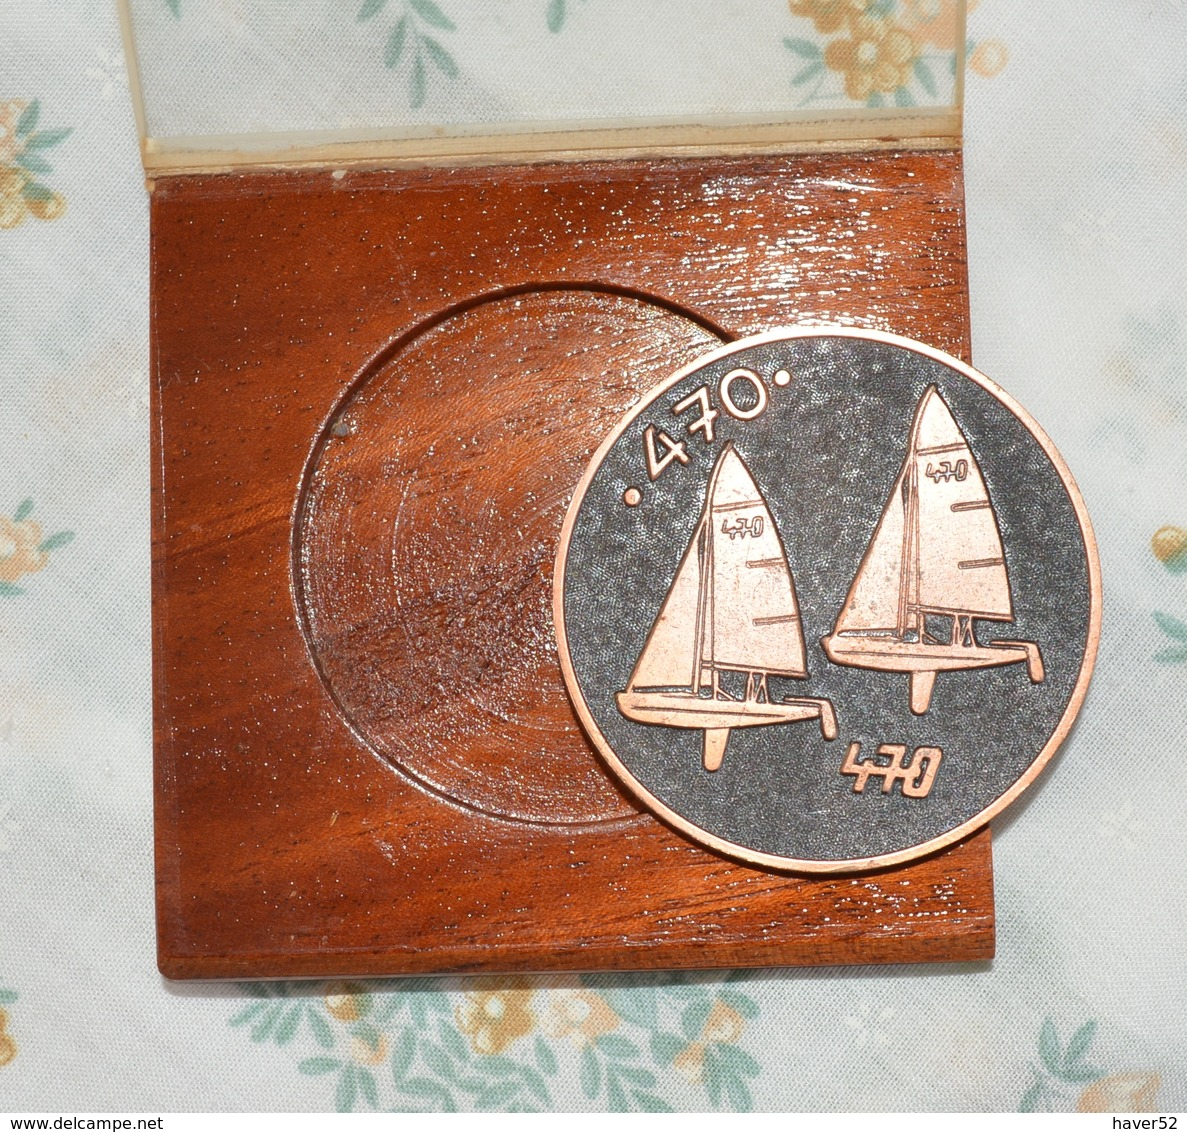 Brons Medal Tallinn 1980 _ 470 CLASS SAILING - Kleding, Souvenirs & Andere